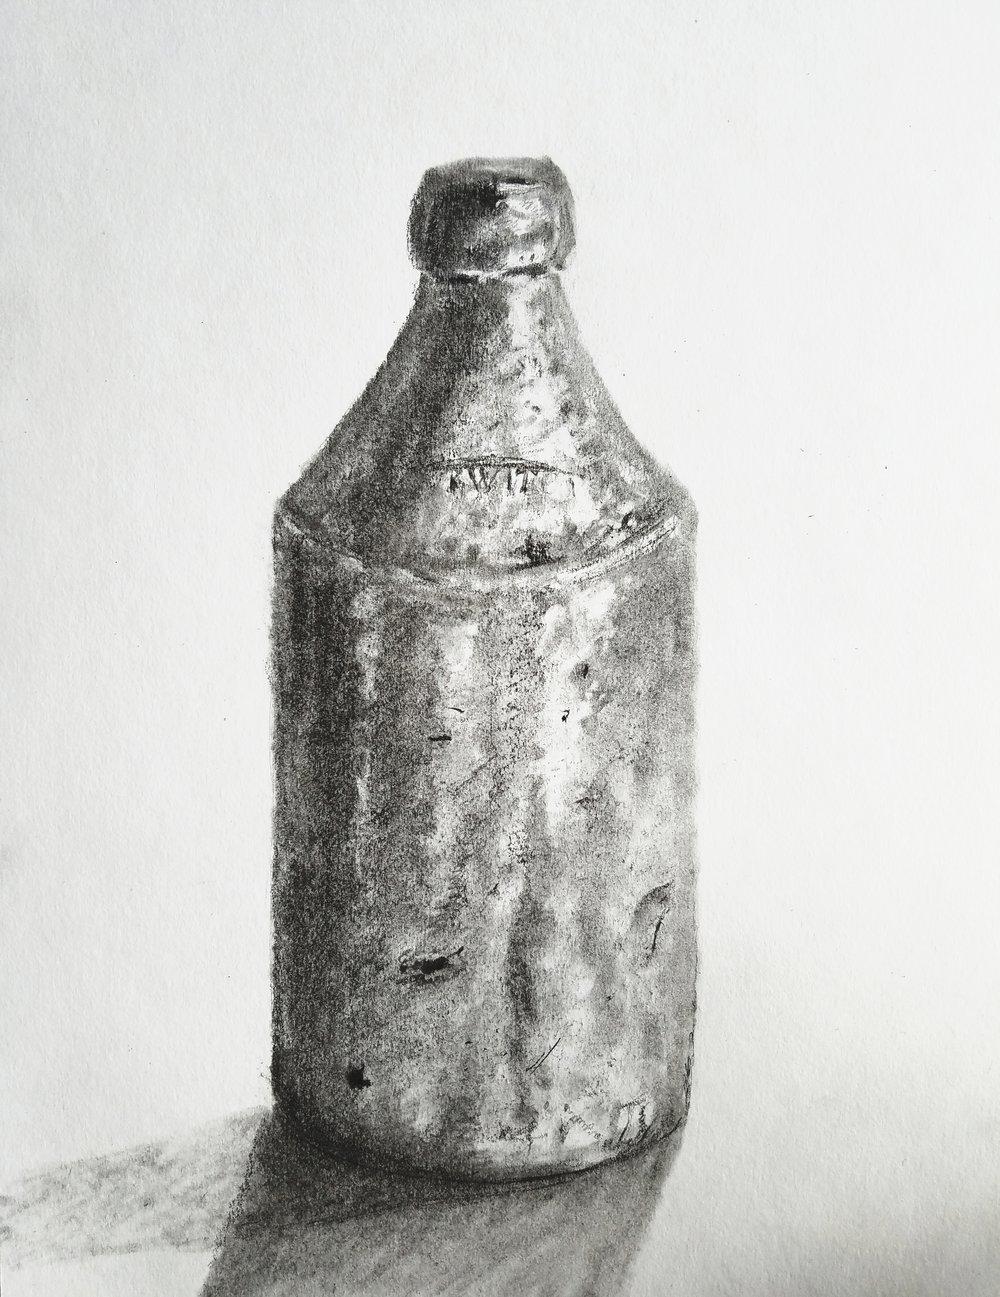 Ceramic Beer Bottle; graphite; 2018